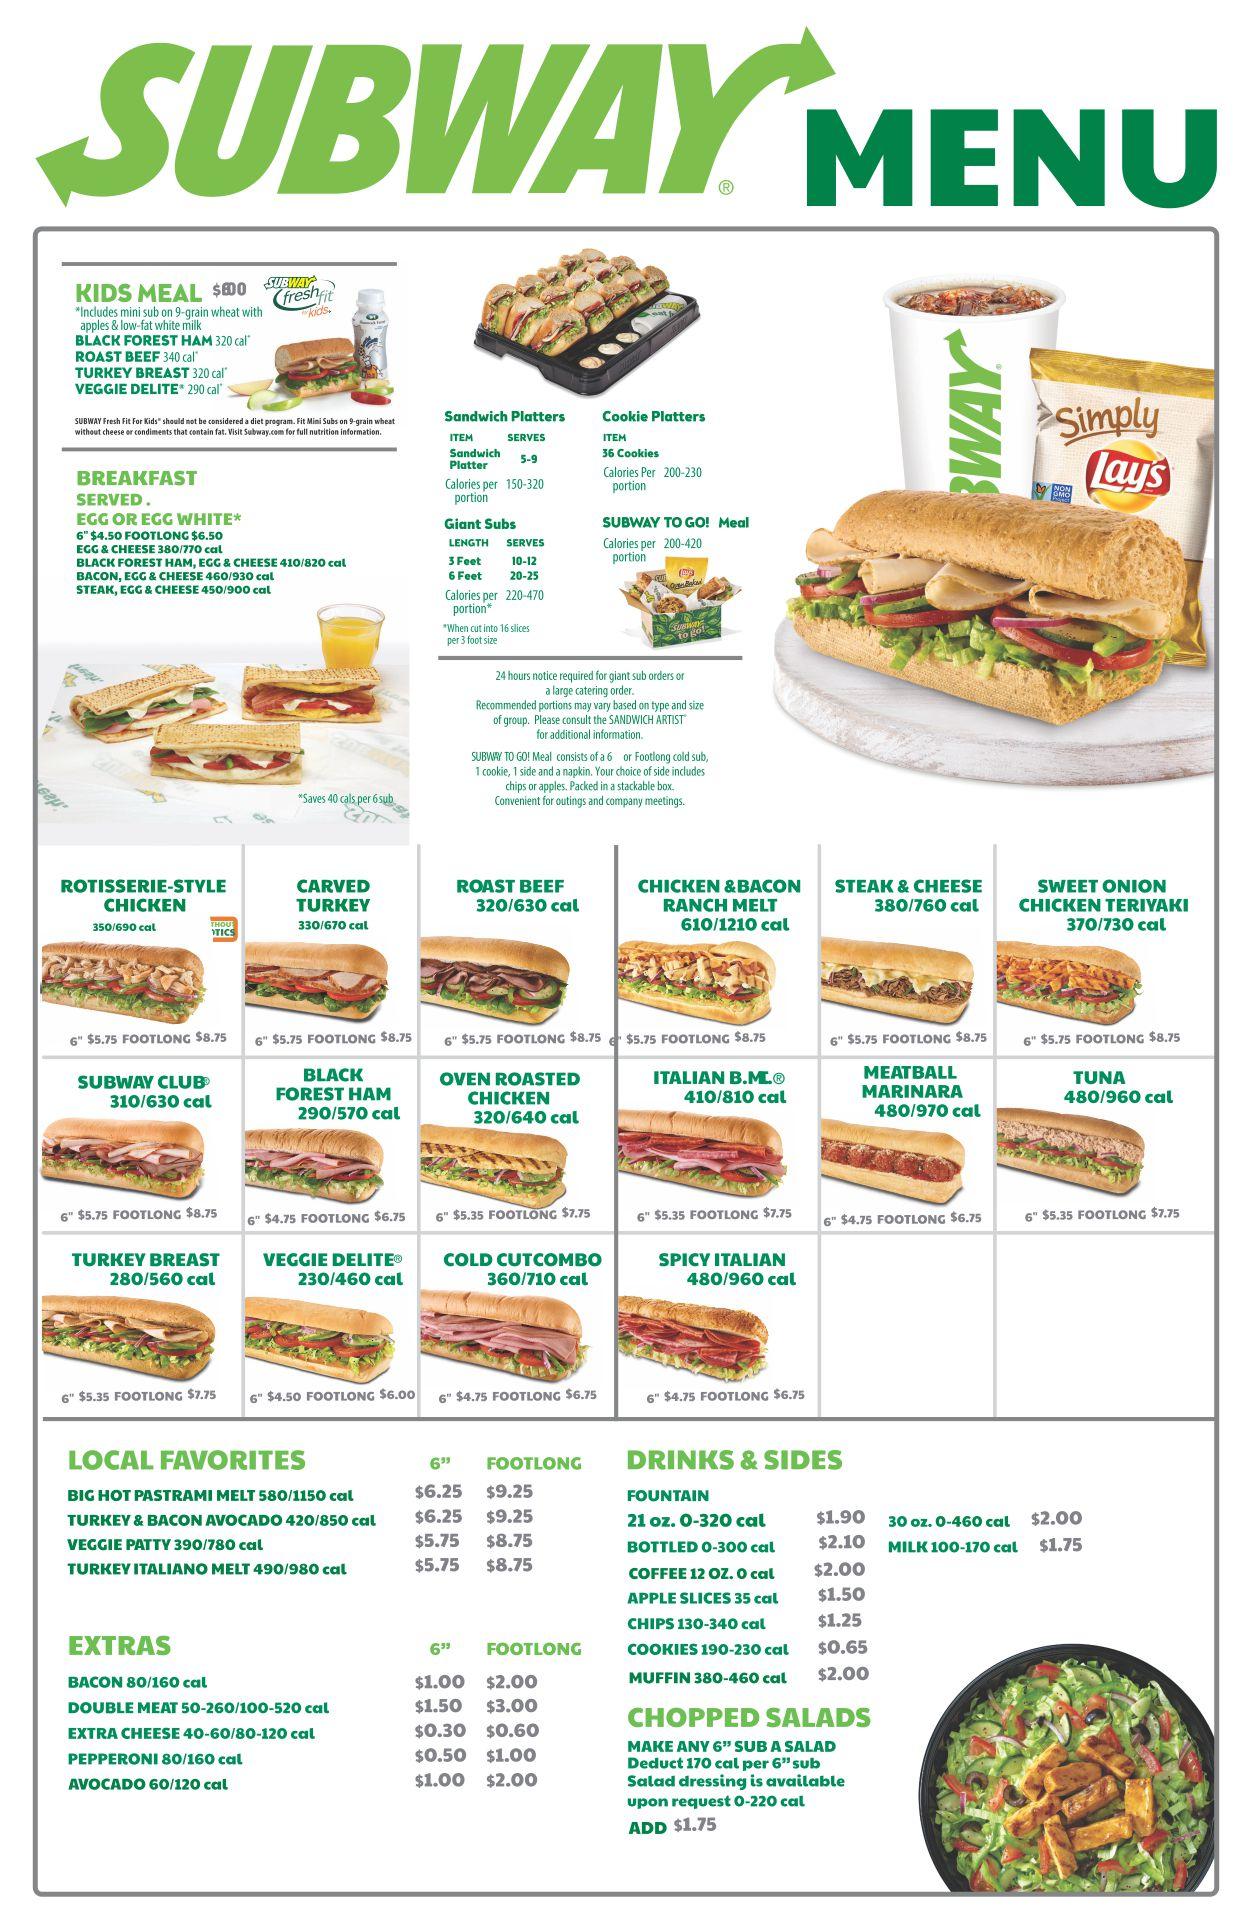 Subway Menu Prices